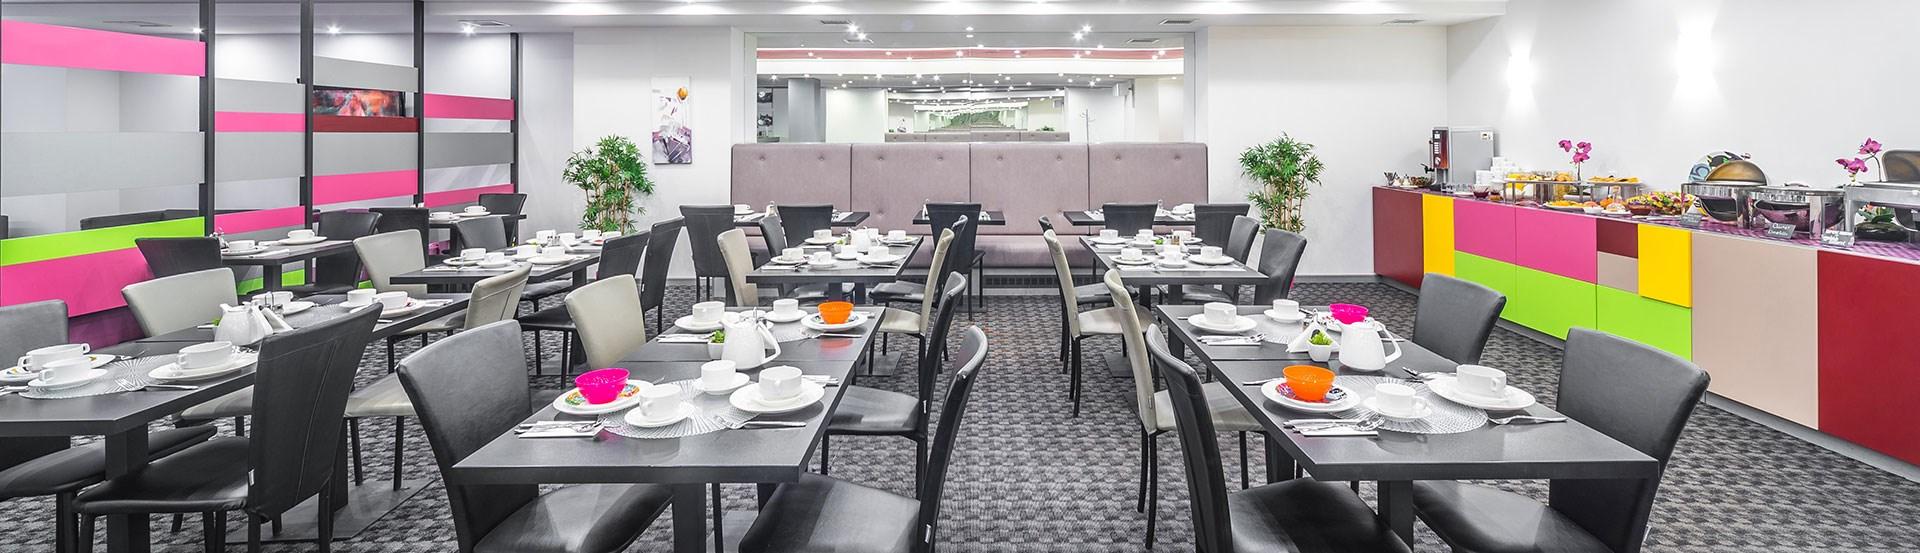 Amarant Hotel Restaurant